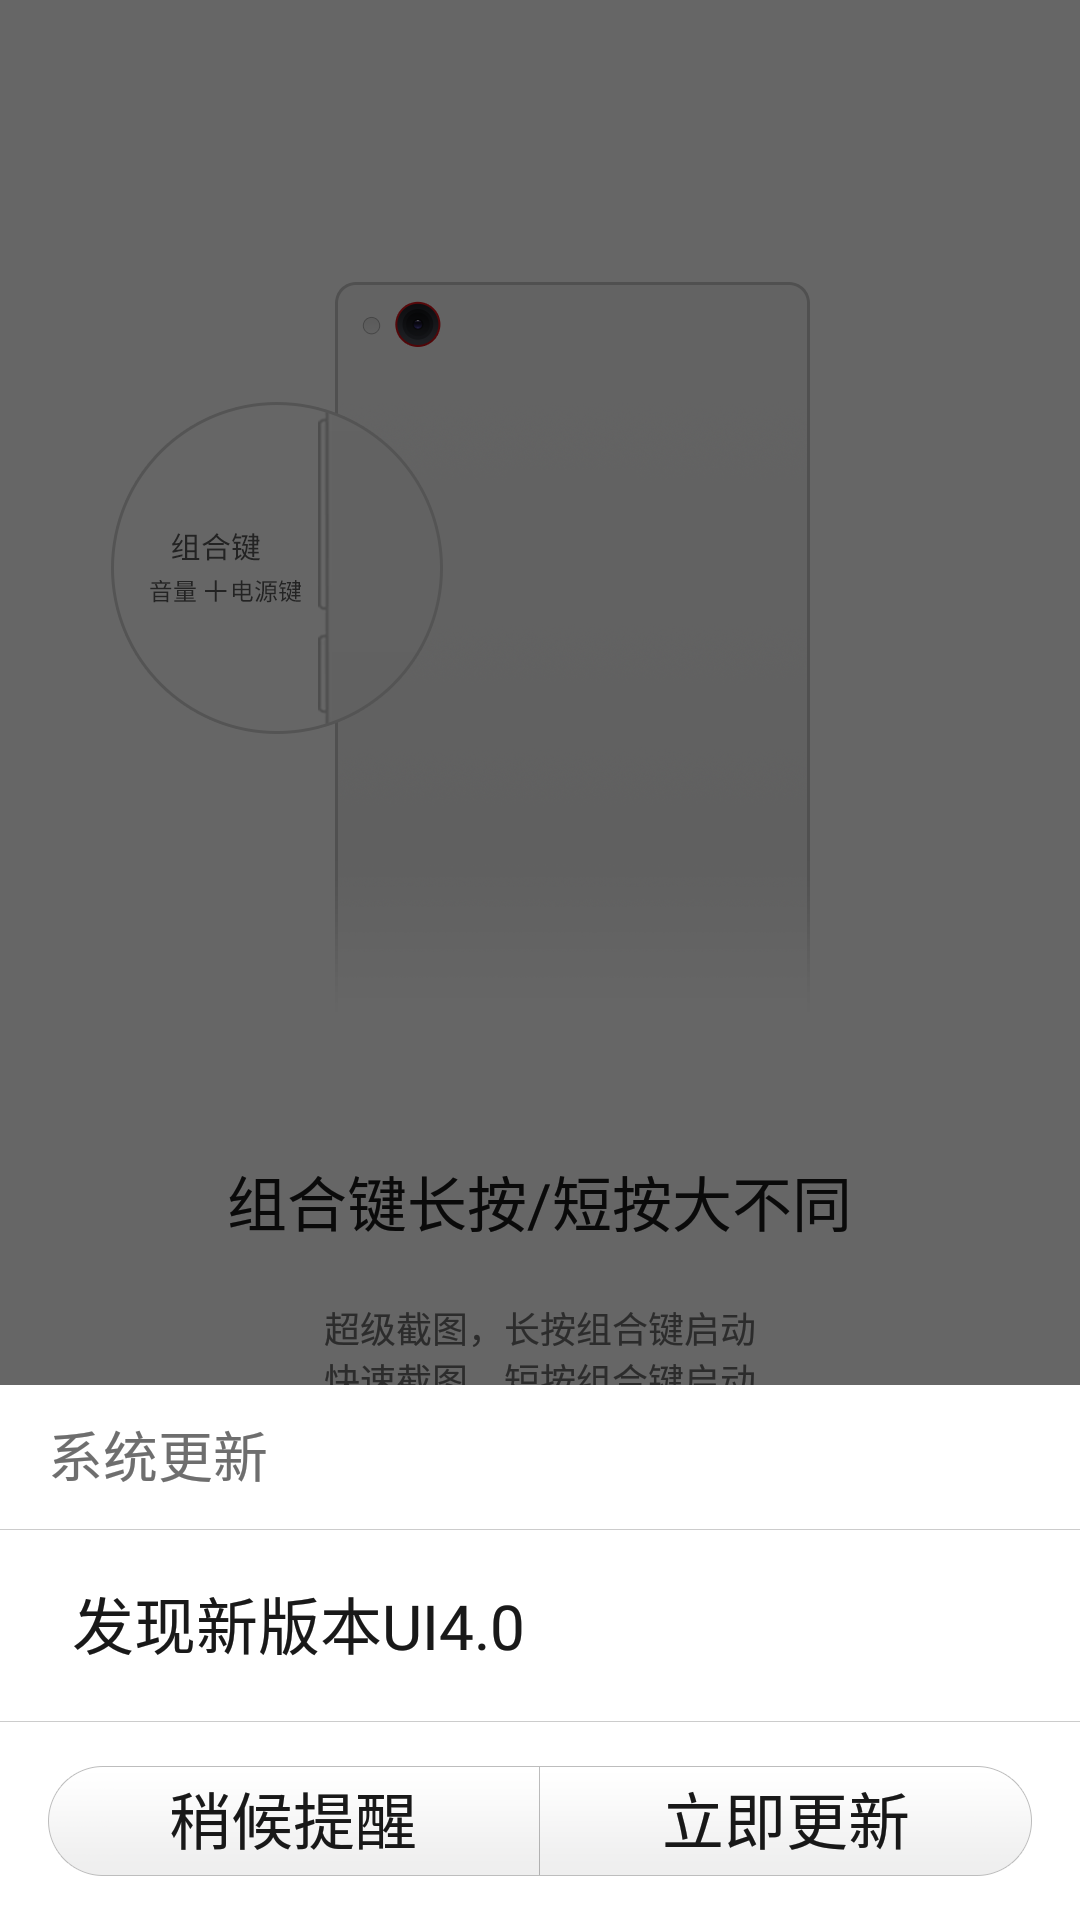 QQ图片20170224100215.png